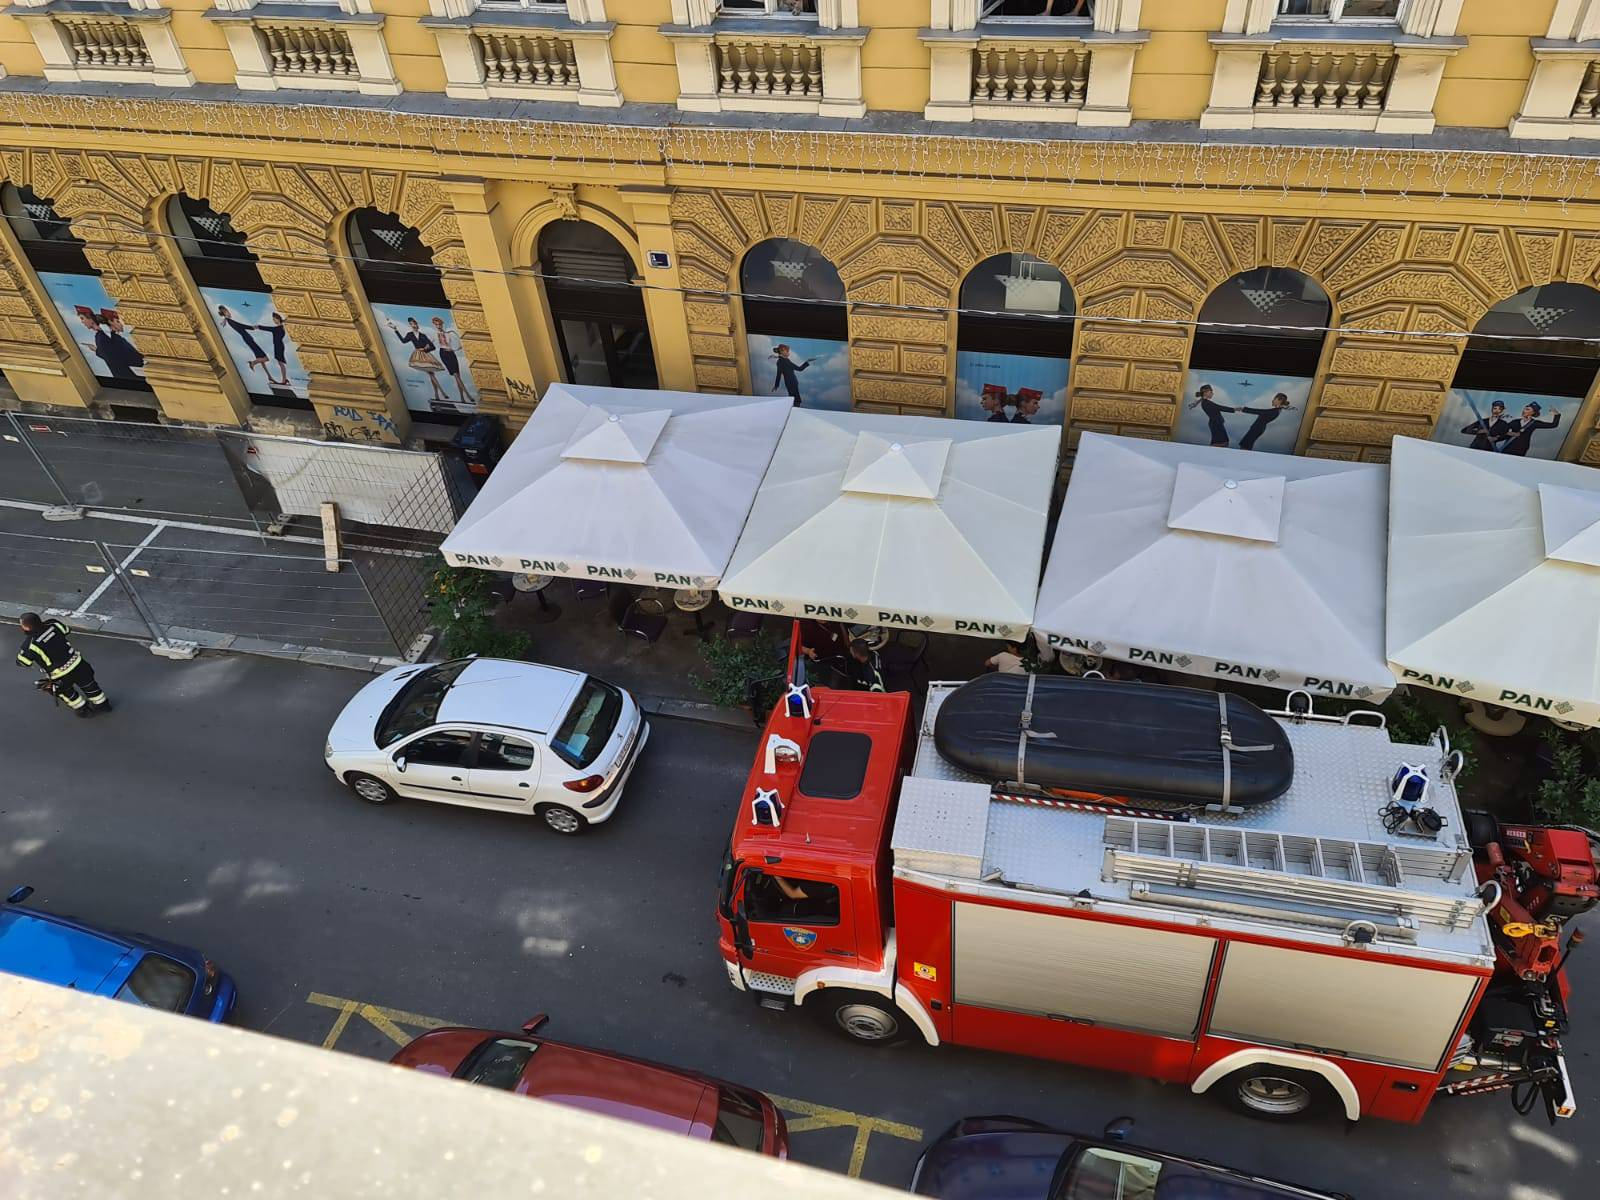 Kakva bahatost! Blokirao cestu autom, vatrogasci trube: Ništa!